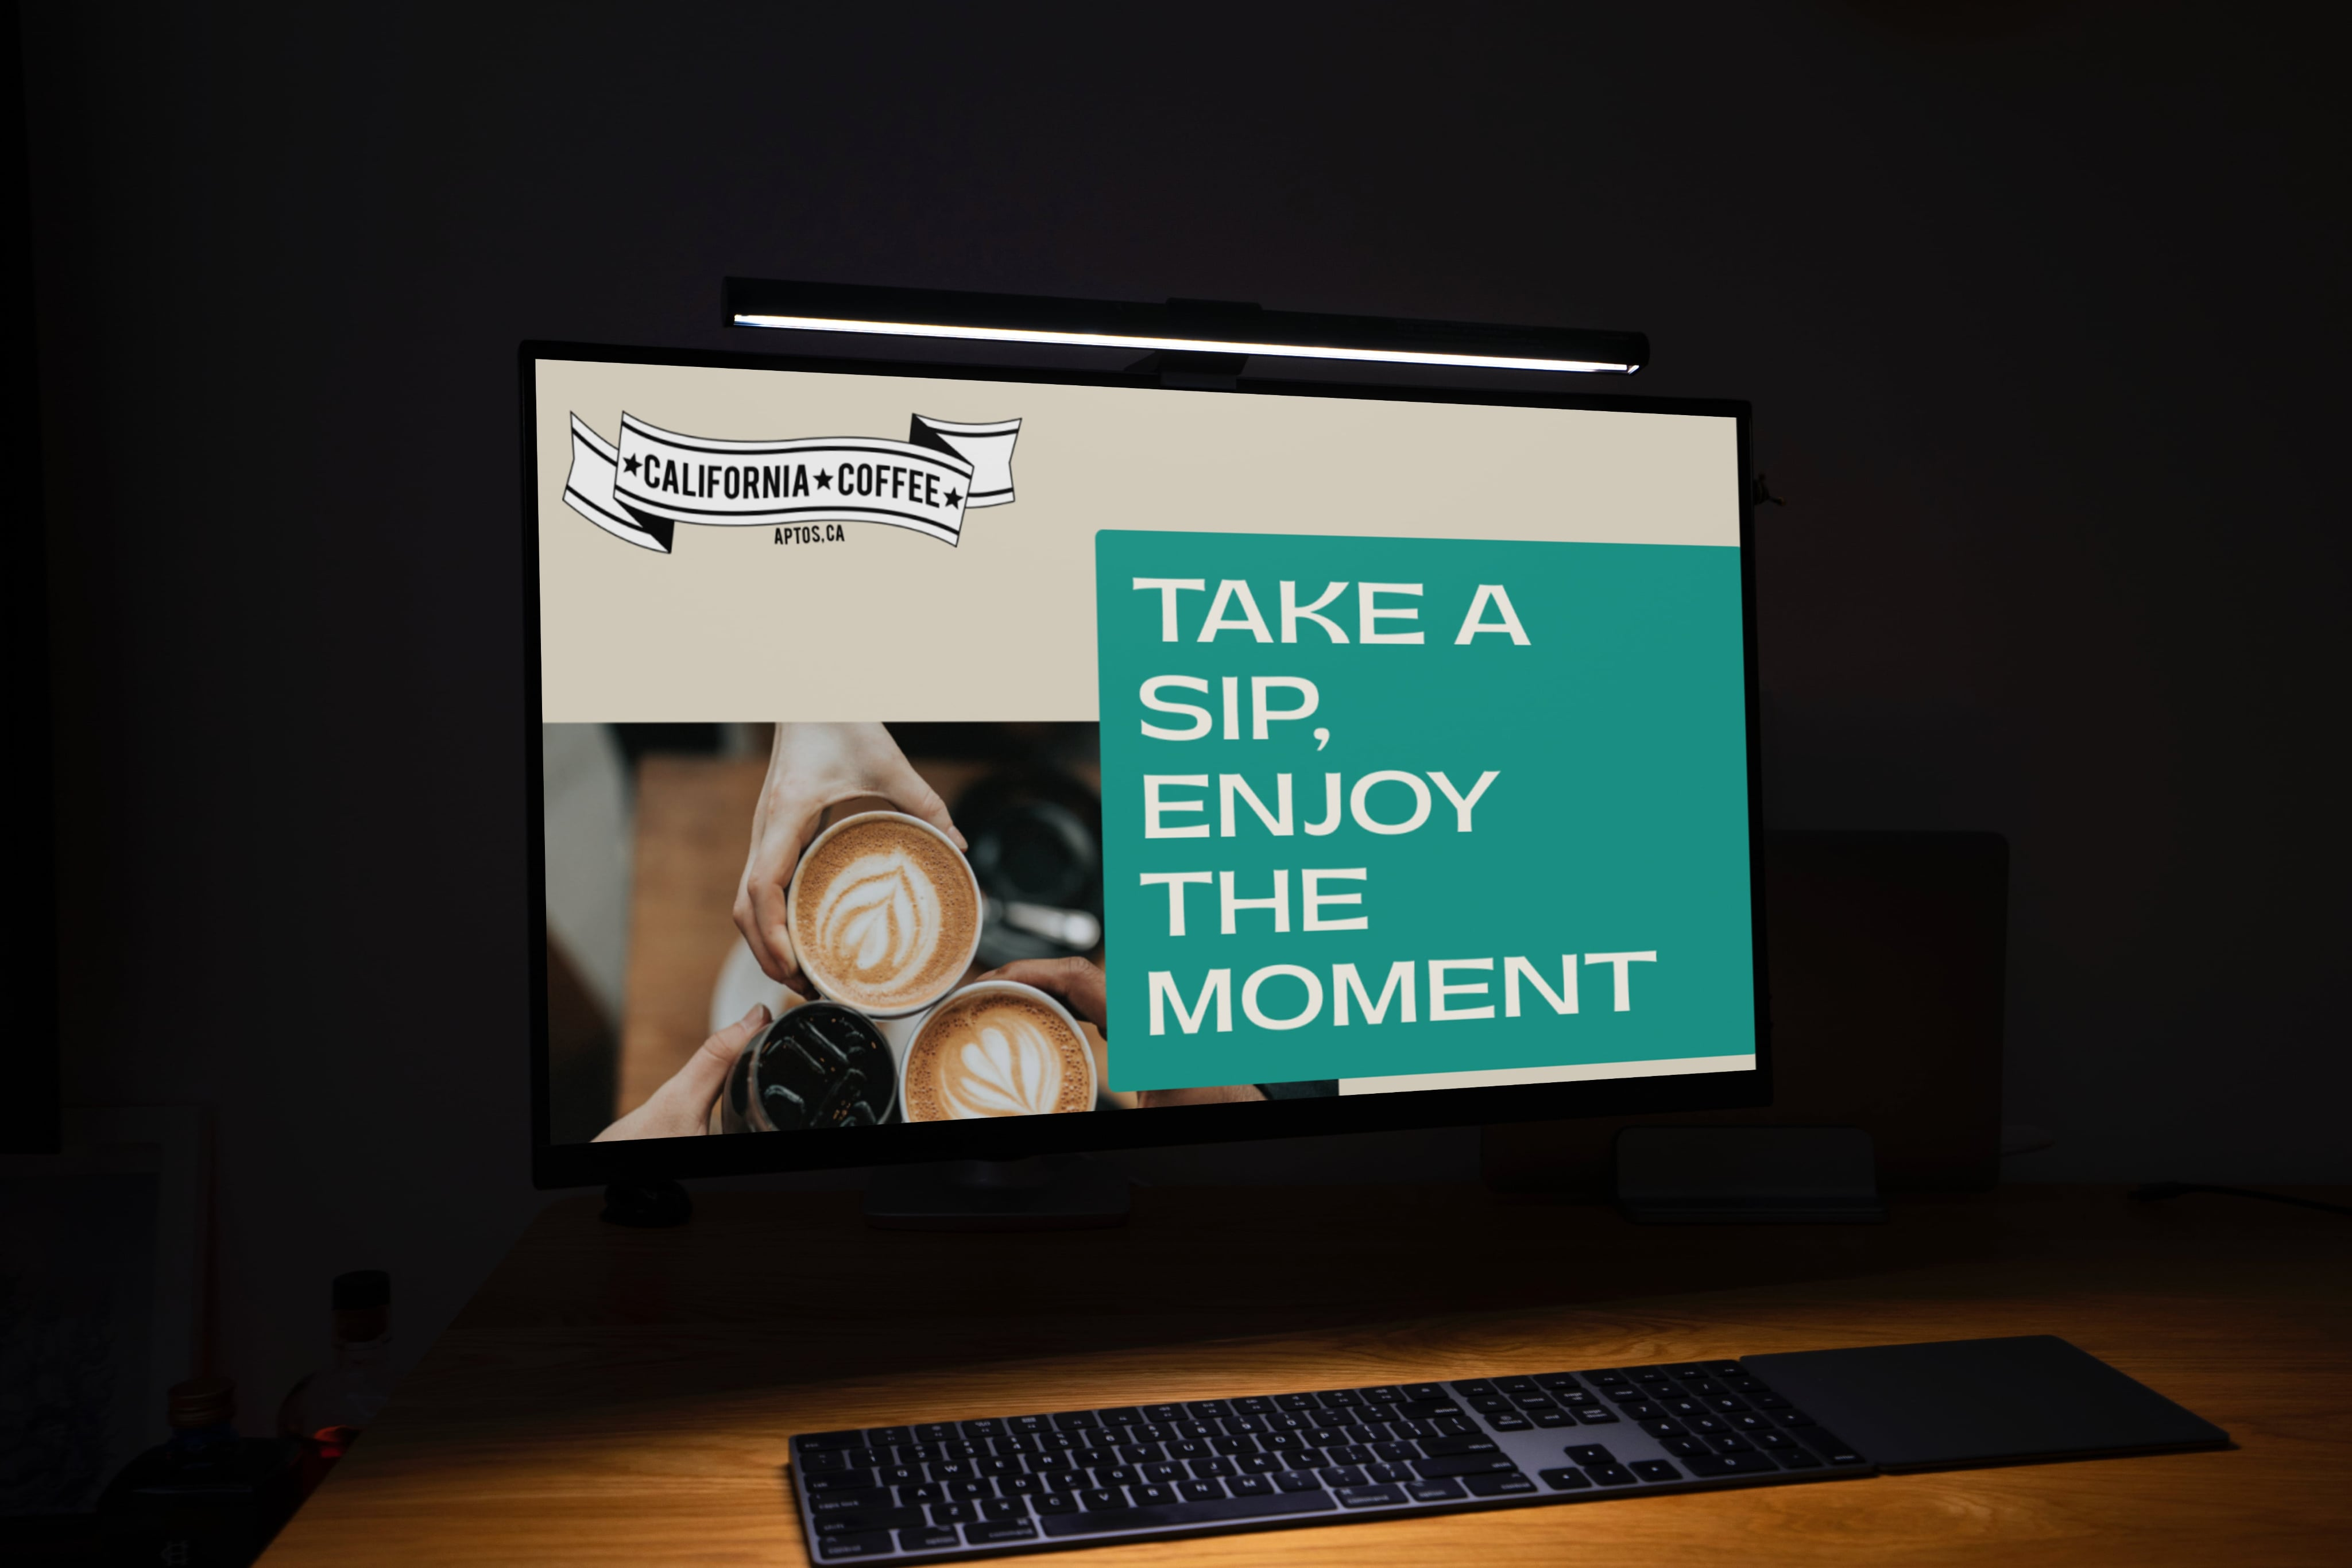 Computer screen showing California Coffee